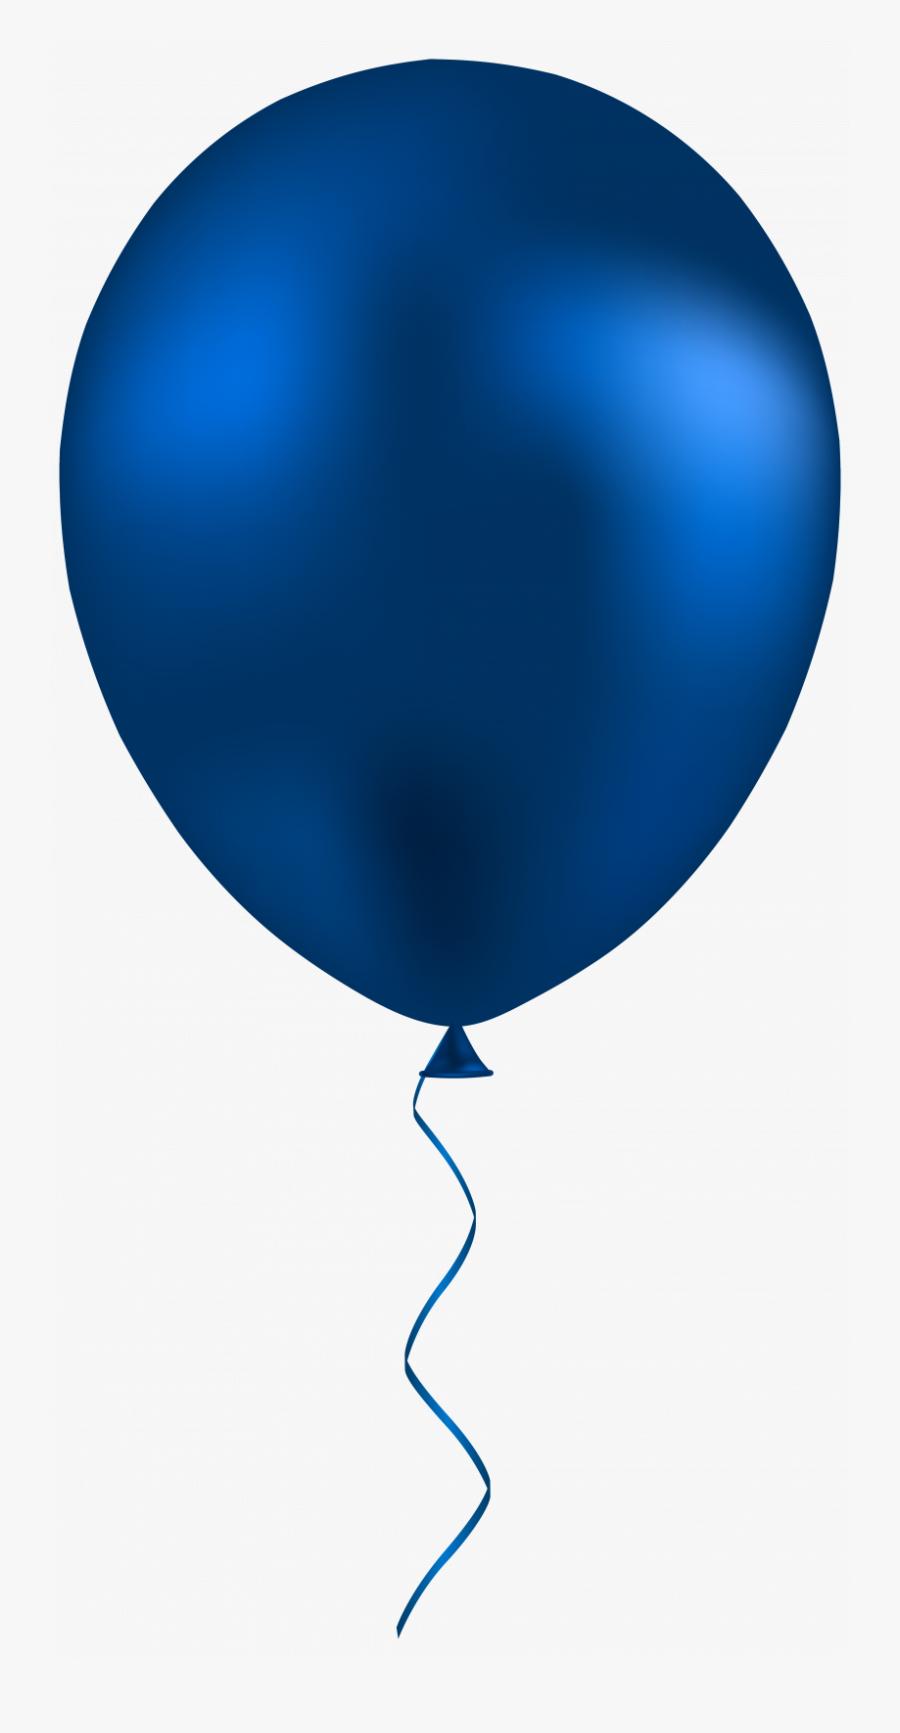 Balloon Free Jokingart Com - Transparent Background Balloons Png, Transparent Clipart